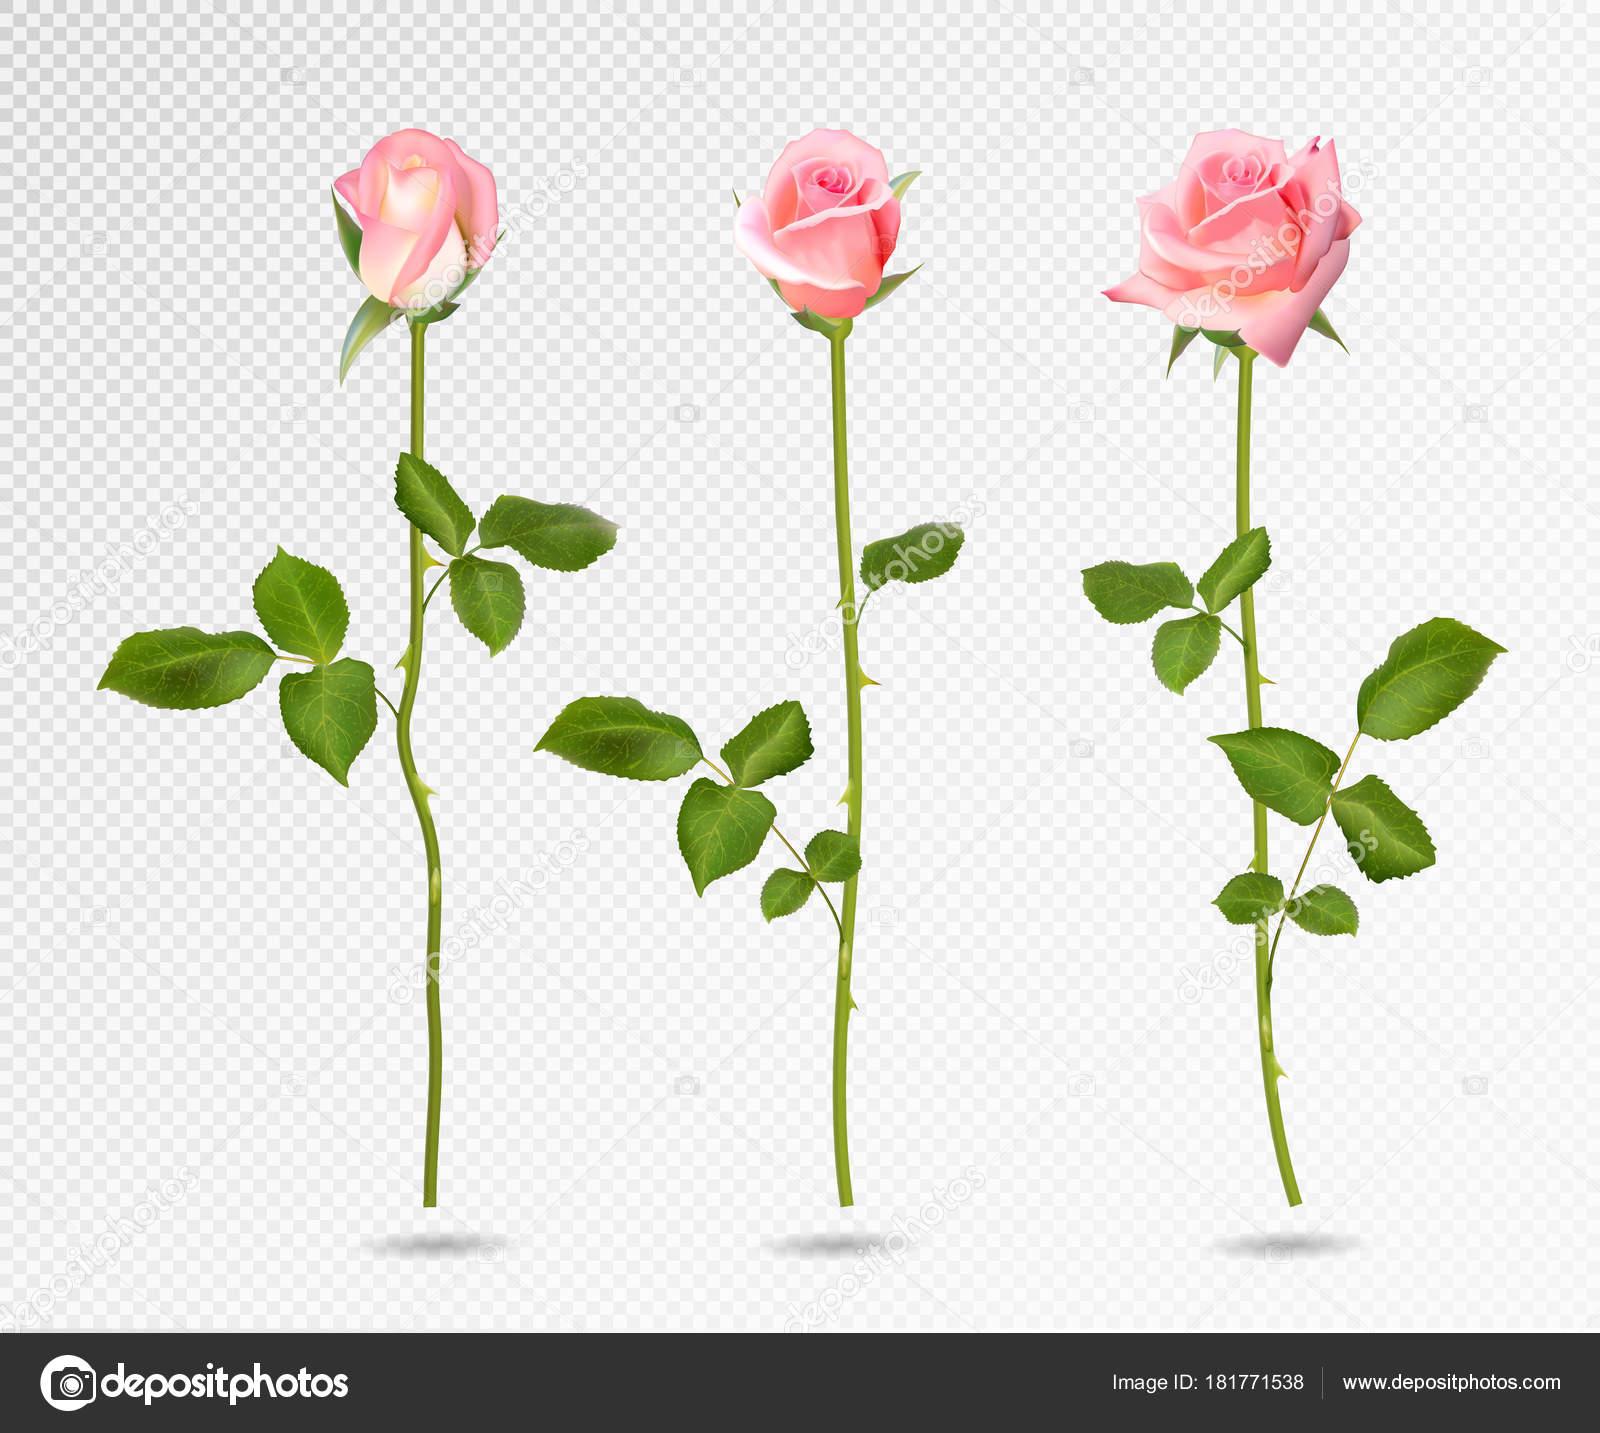 Букет роз в векторе на прозрачном фоне, интернет магазин цветов аристократка